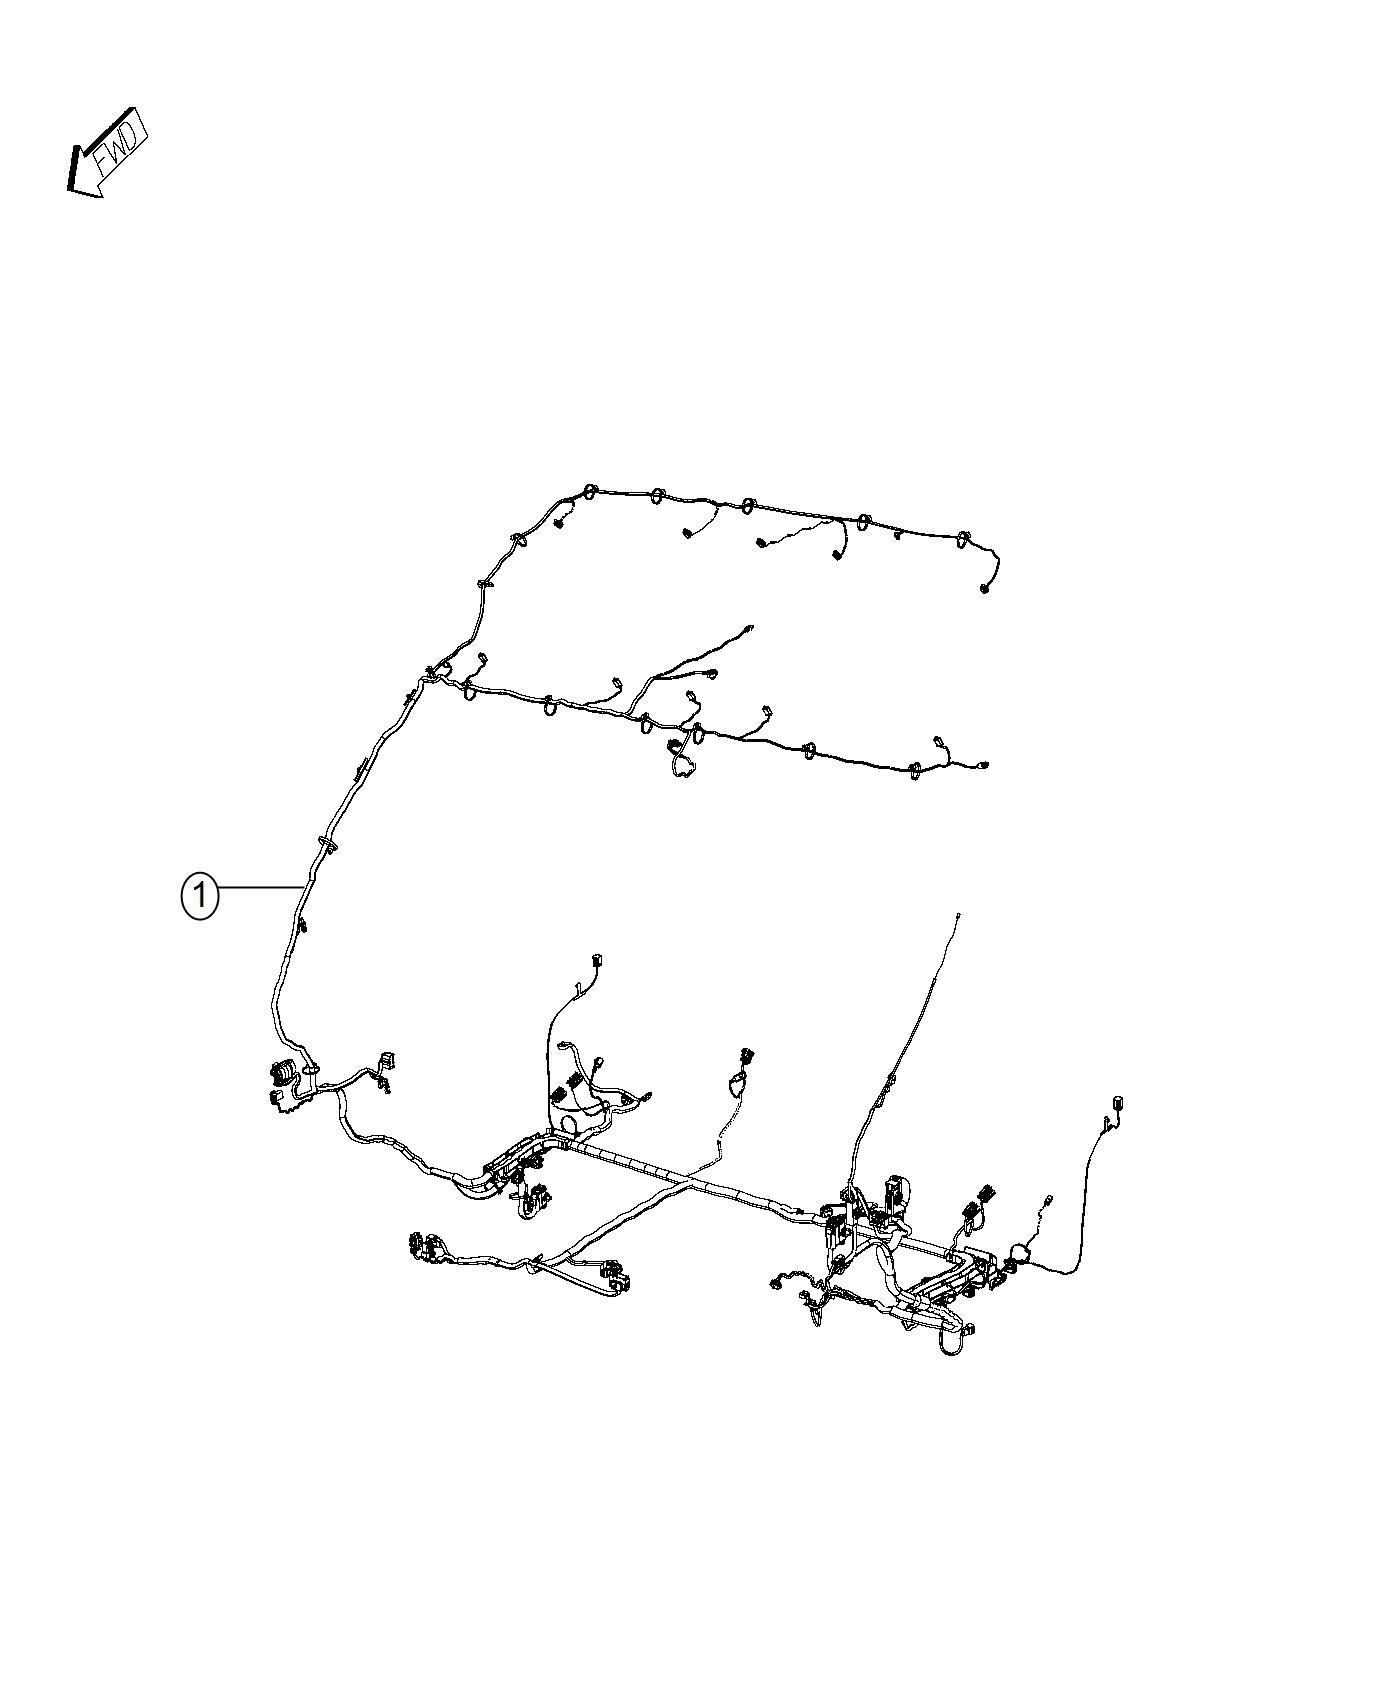 ram promaster wiring body interior gtr or power. Black Bedroom Furniture Sets. Home Design Ideas